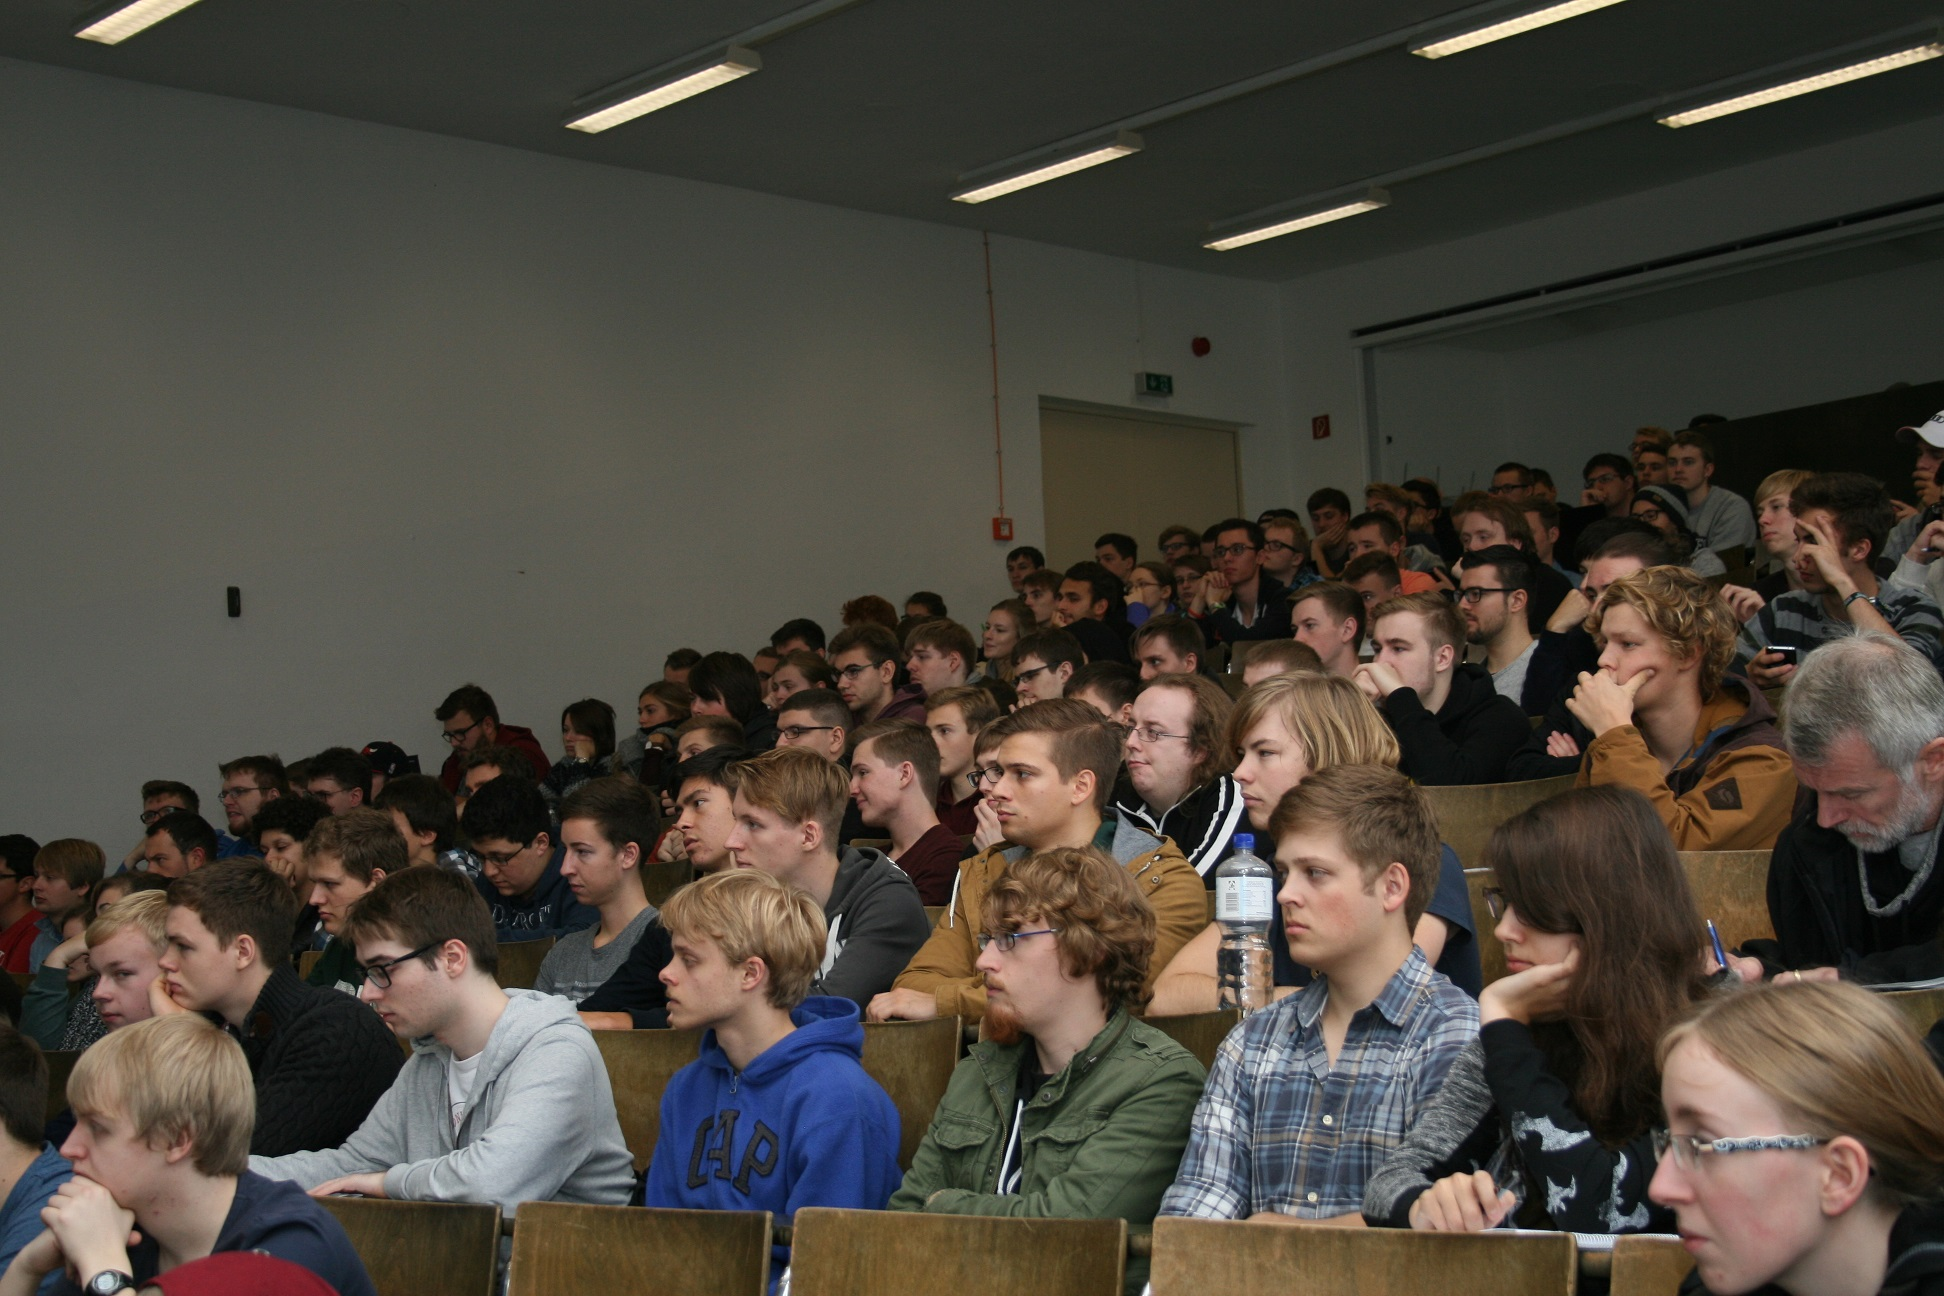 Großzügig Aktuelles Lebenslaufformat Für Erstsemester 2013 ...